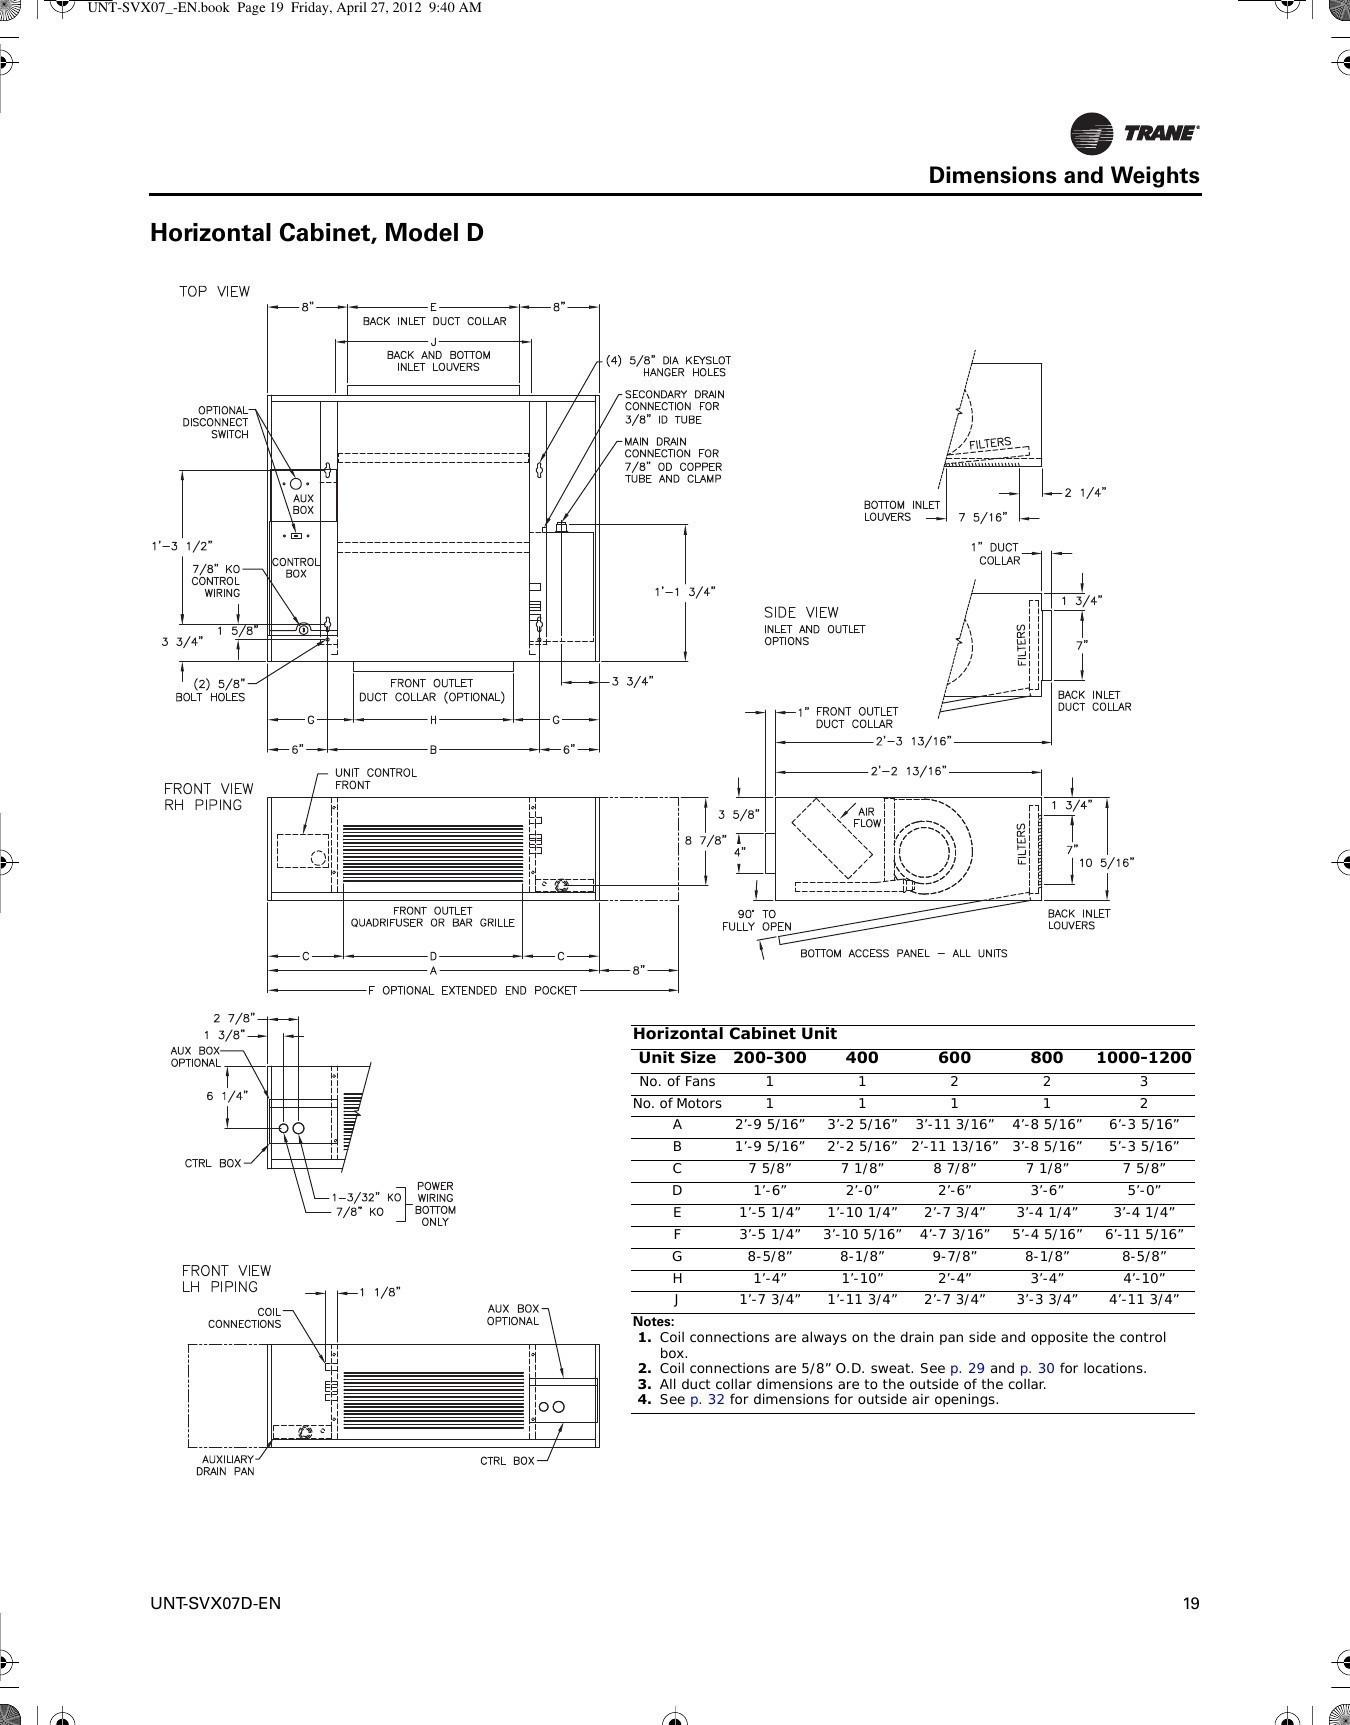 Samsung Dryer Wiring Diagram Ao 1130] Appliantology Archive Washer and Dryer Wiring Diagrams Of Samsung Dryer Wiring Diagram